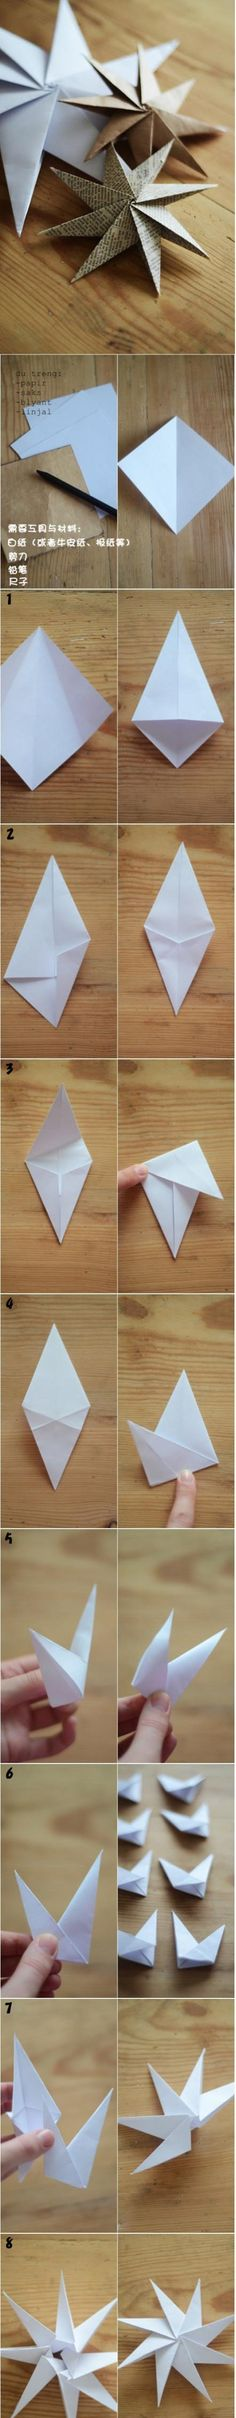 DIY Paper Stars diy craft crafts craft